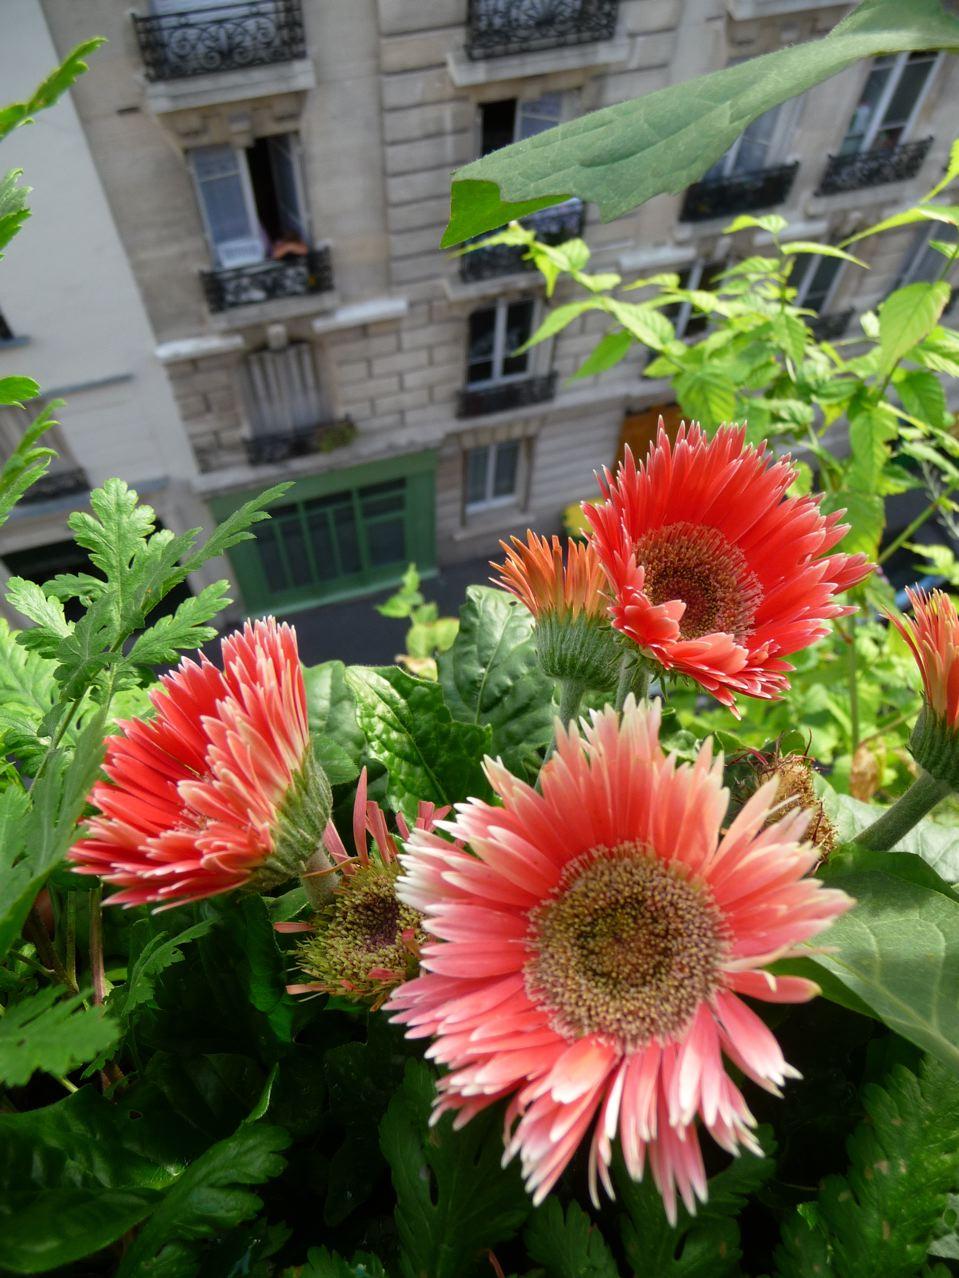 Jardin suspendu au 5e étage dans Paris